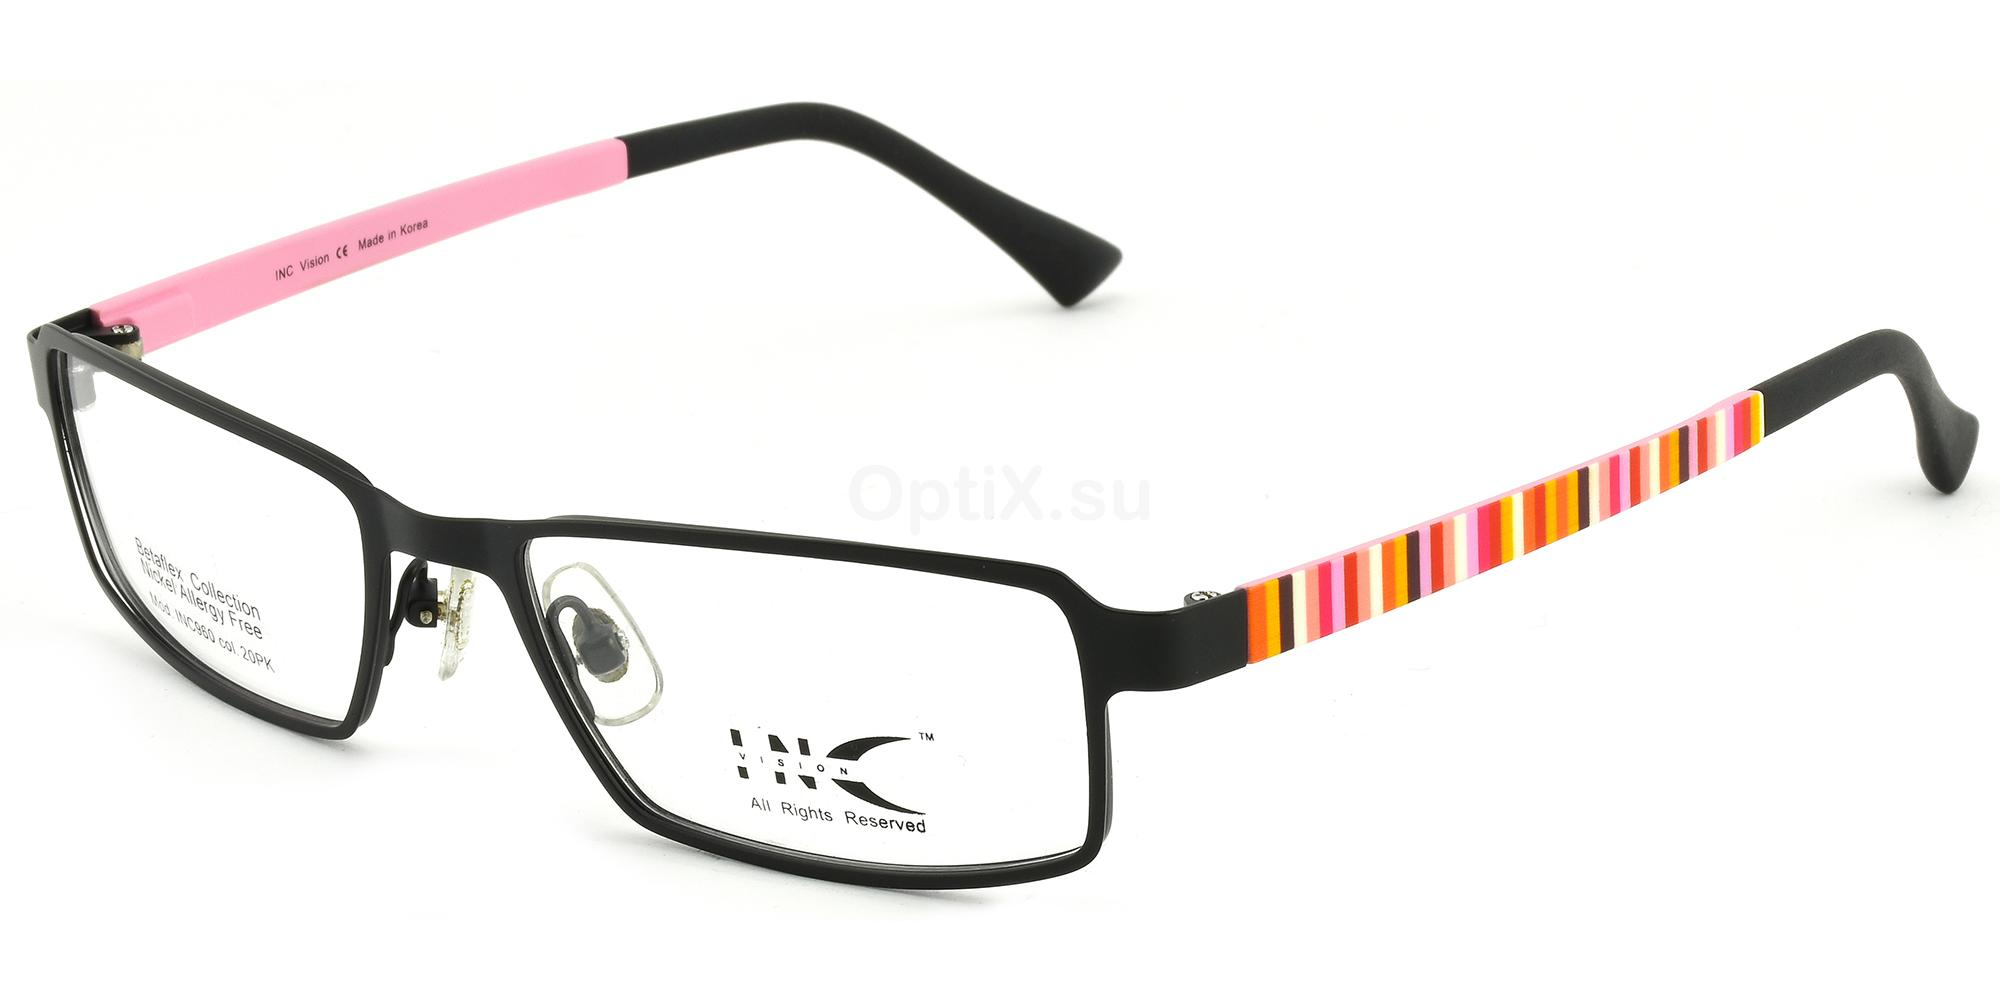 20PK INC 960 Glasses, INC Vision